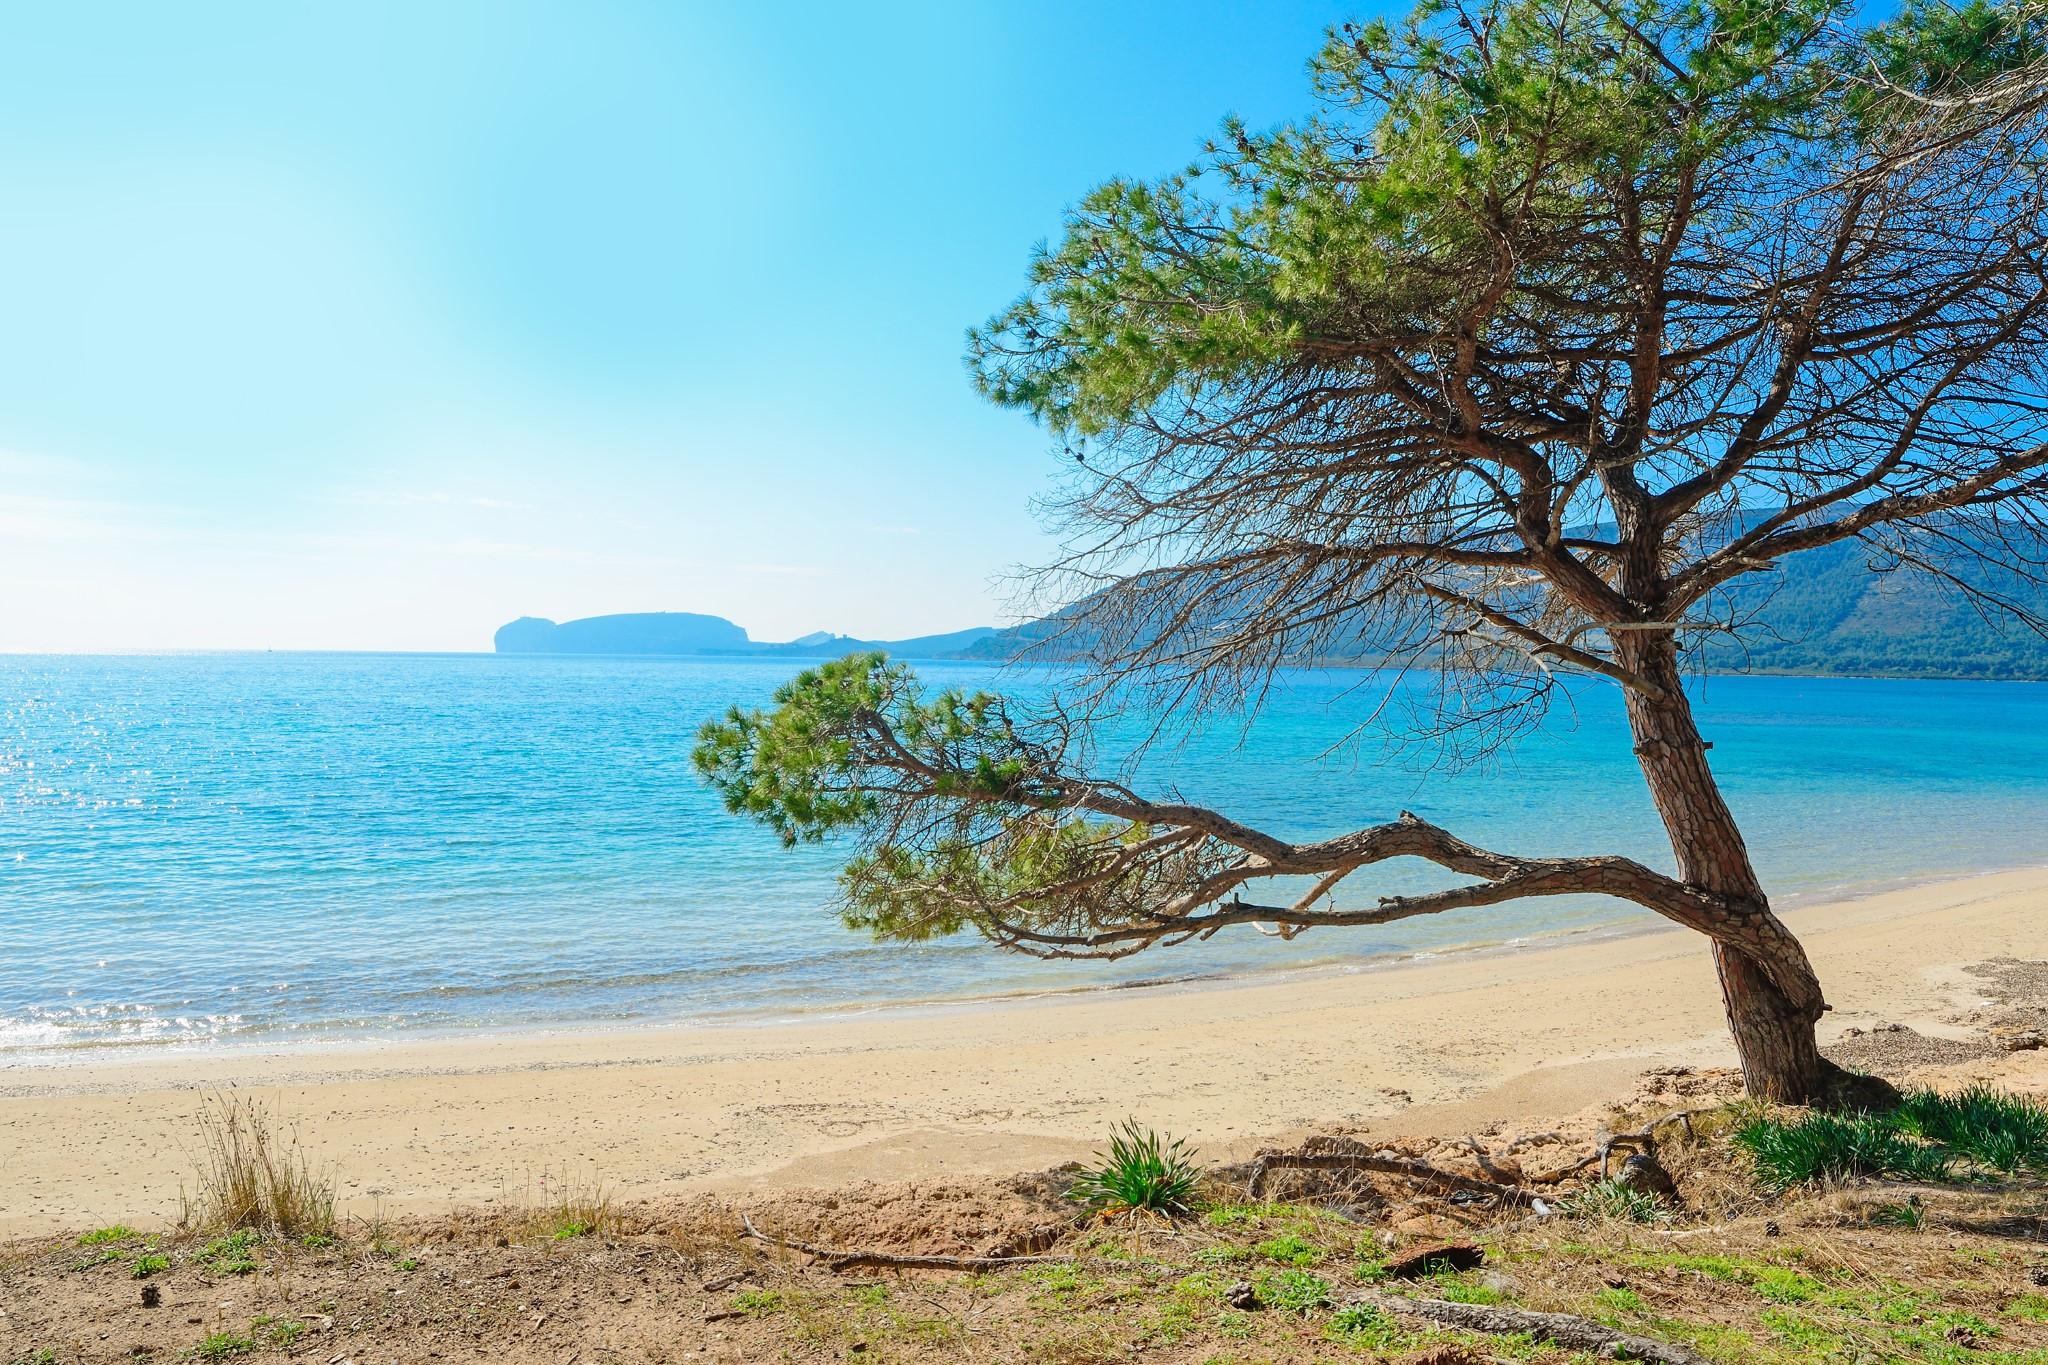 pine tree by the sea in Mugoni beach, Sardinia